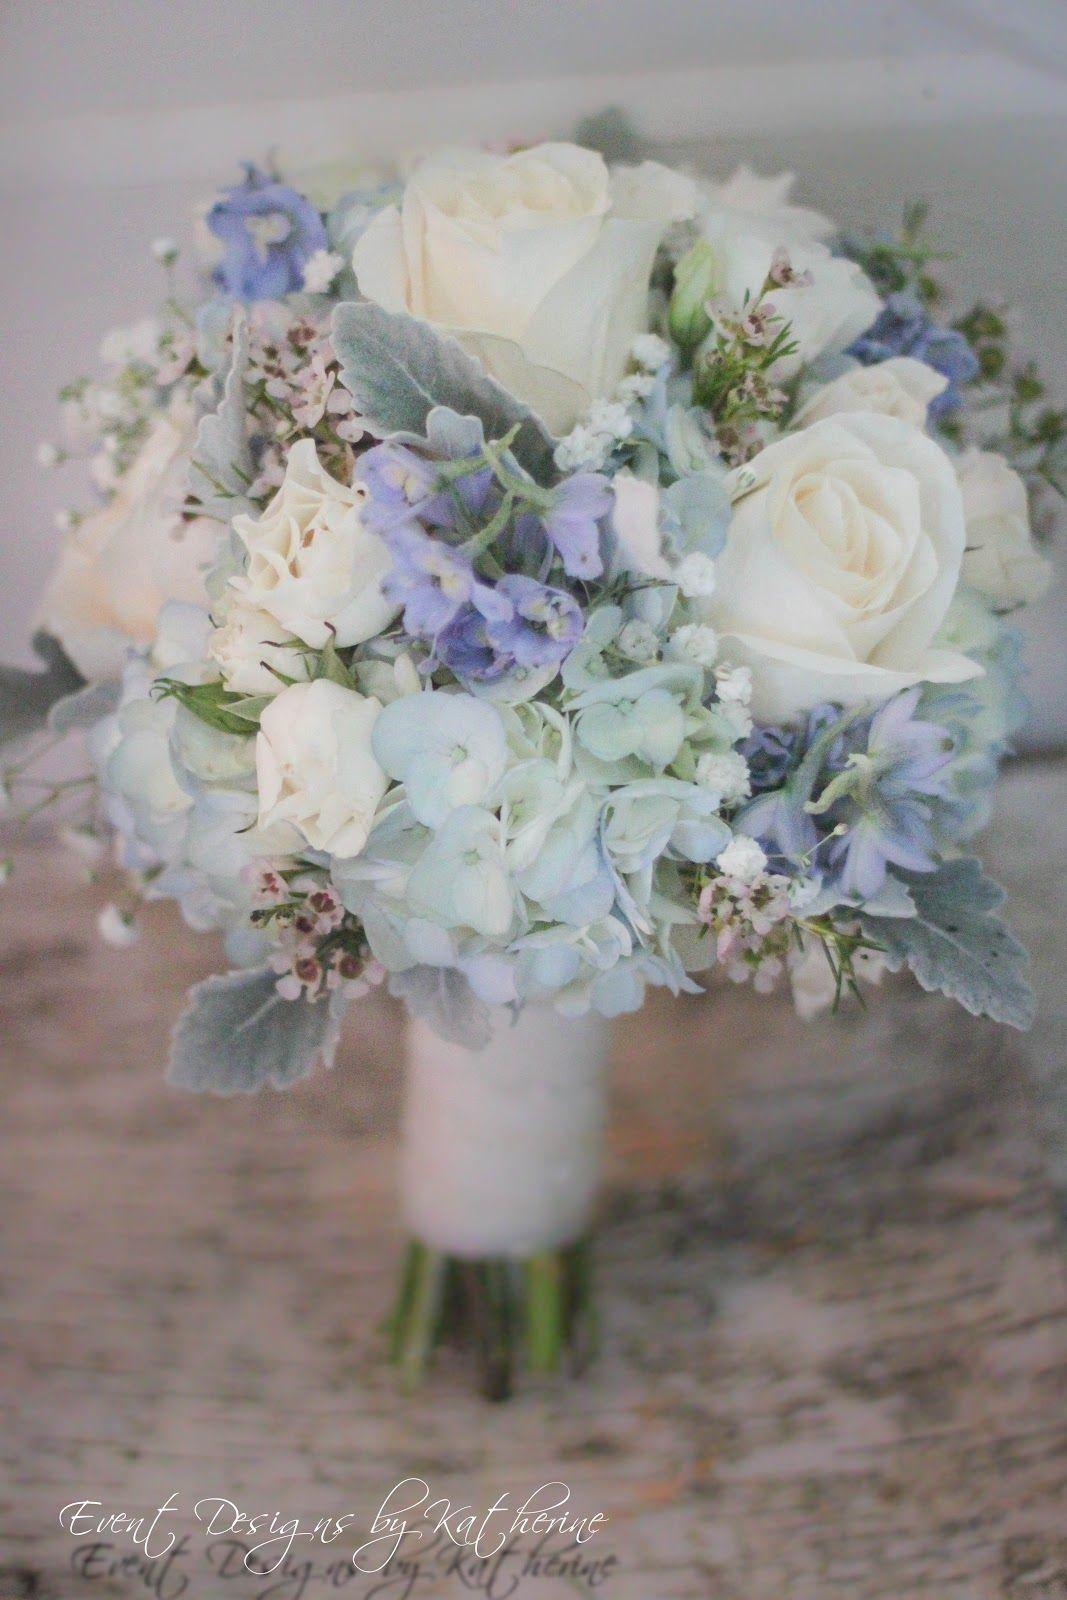 Pastel blue wedding wedding ideas for brides grooms parents pastel blue and white wedding bouquet izmirmasajfo